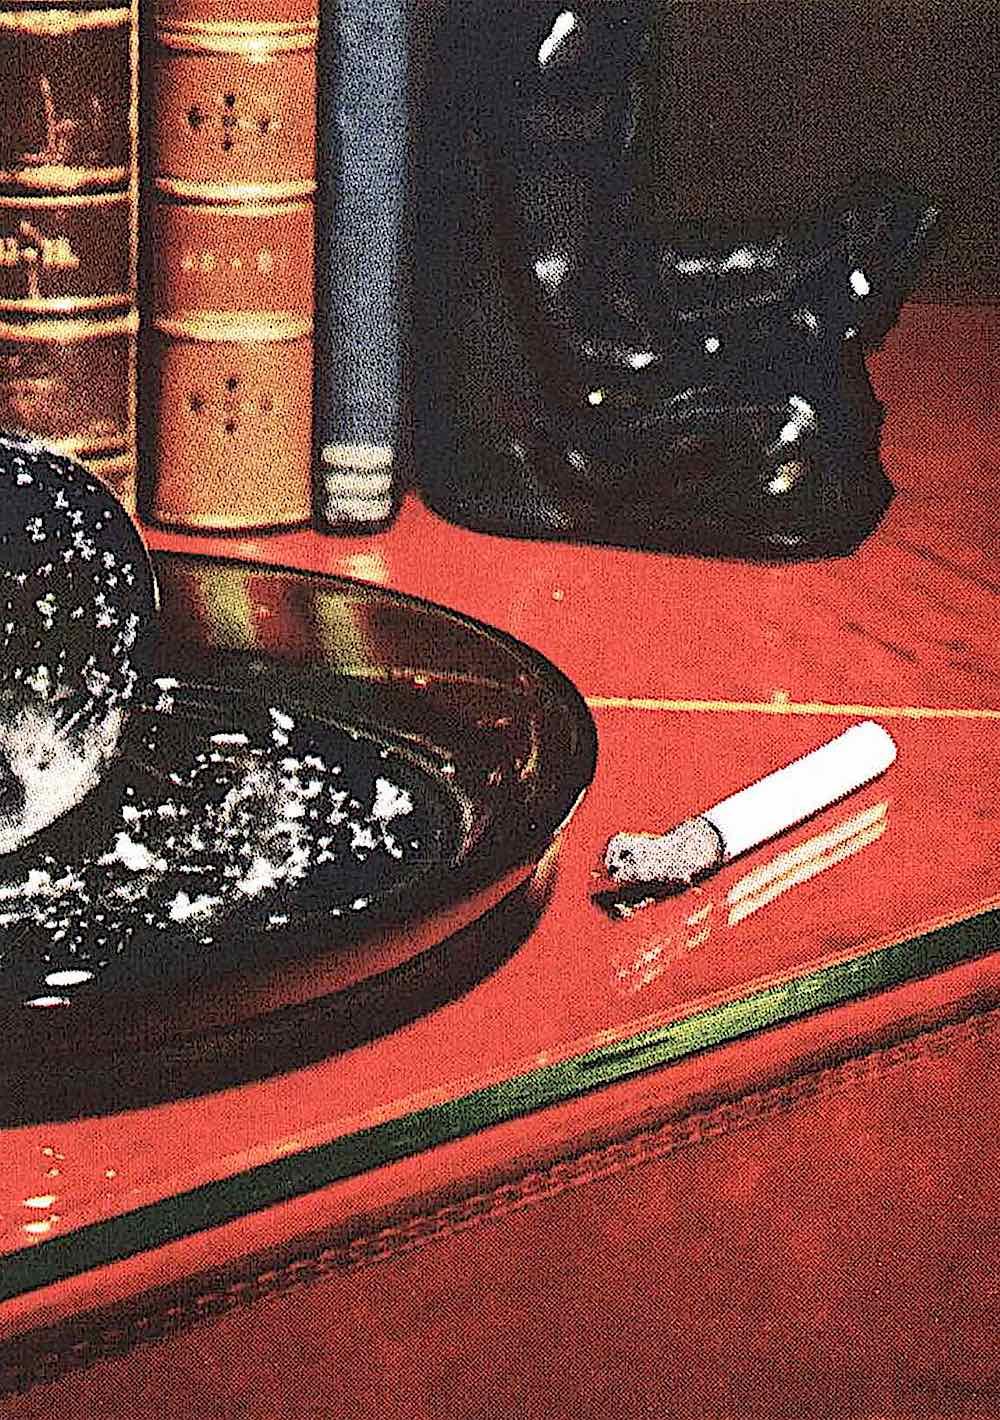 1950 alcohol drugs tobacco, unattended cigarette